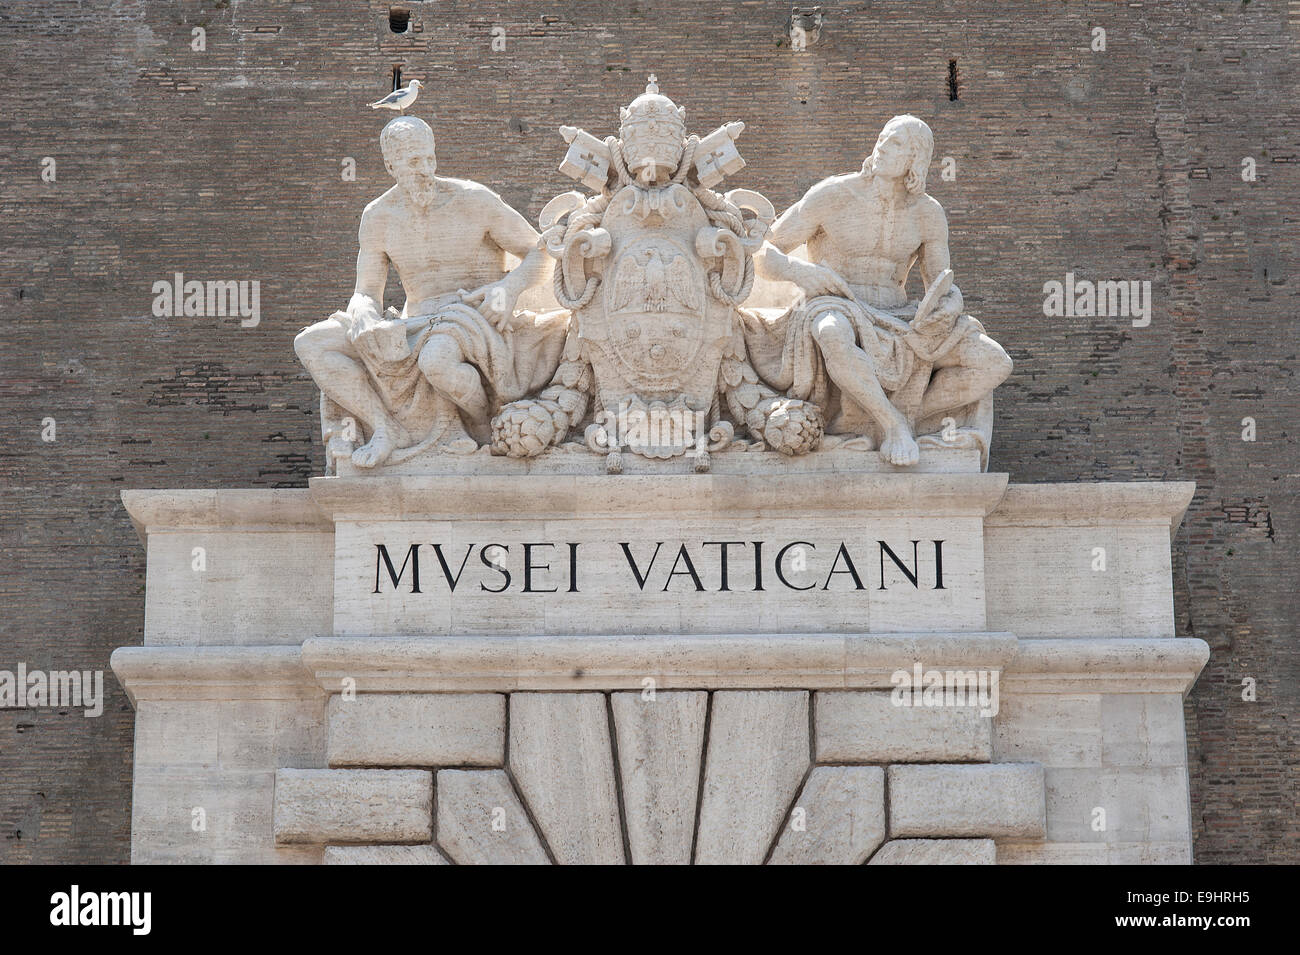 Die Vatikanischen Museen Stockfoto Bild 74765073 Alamy